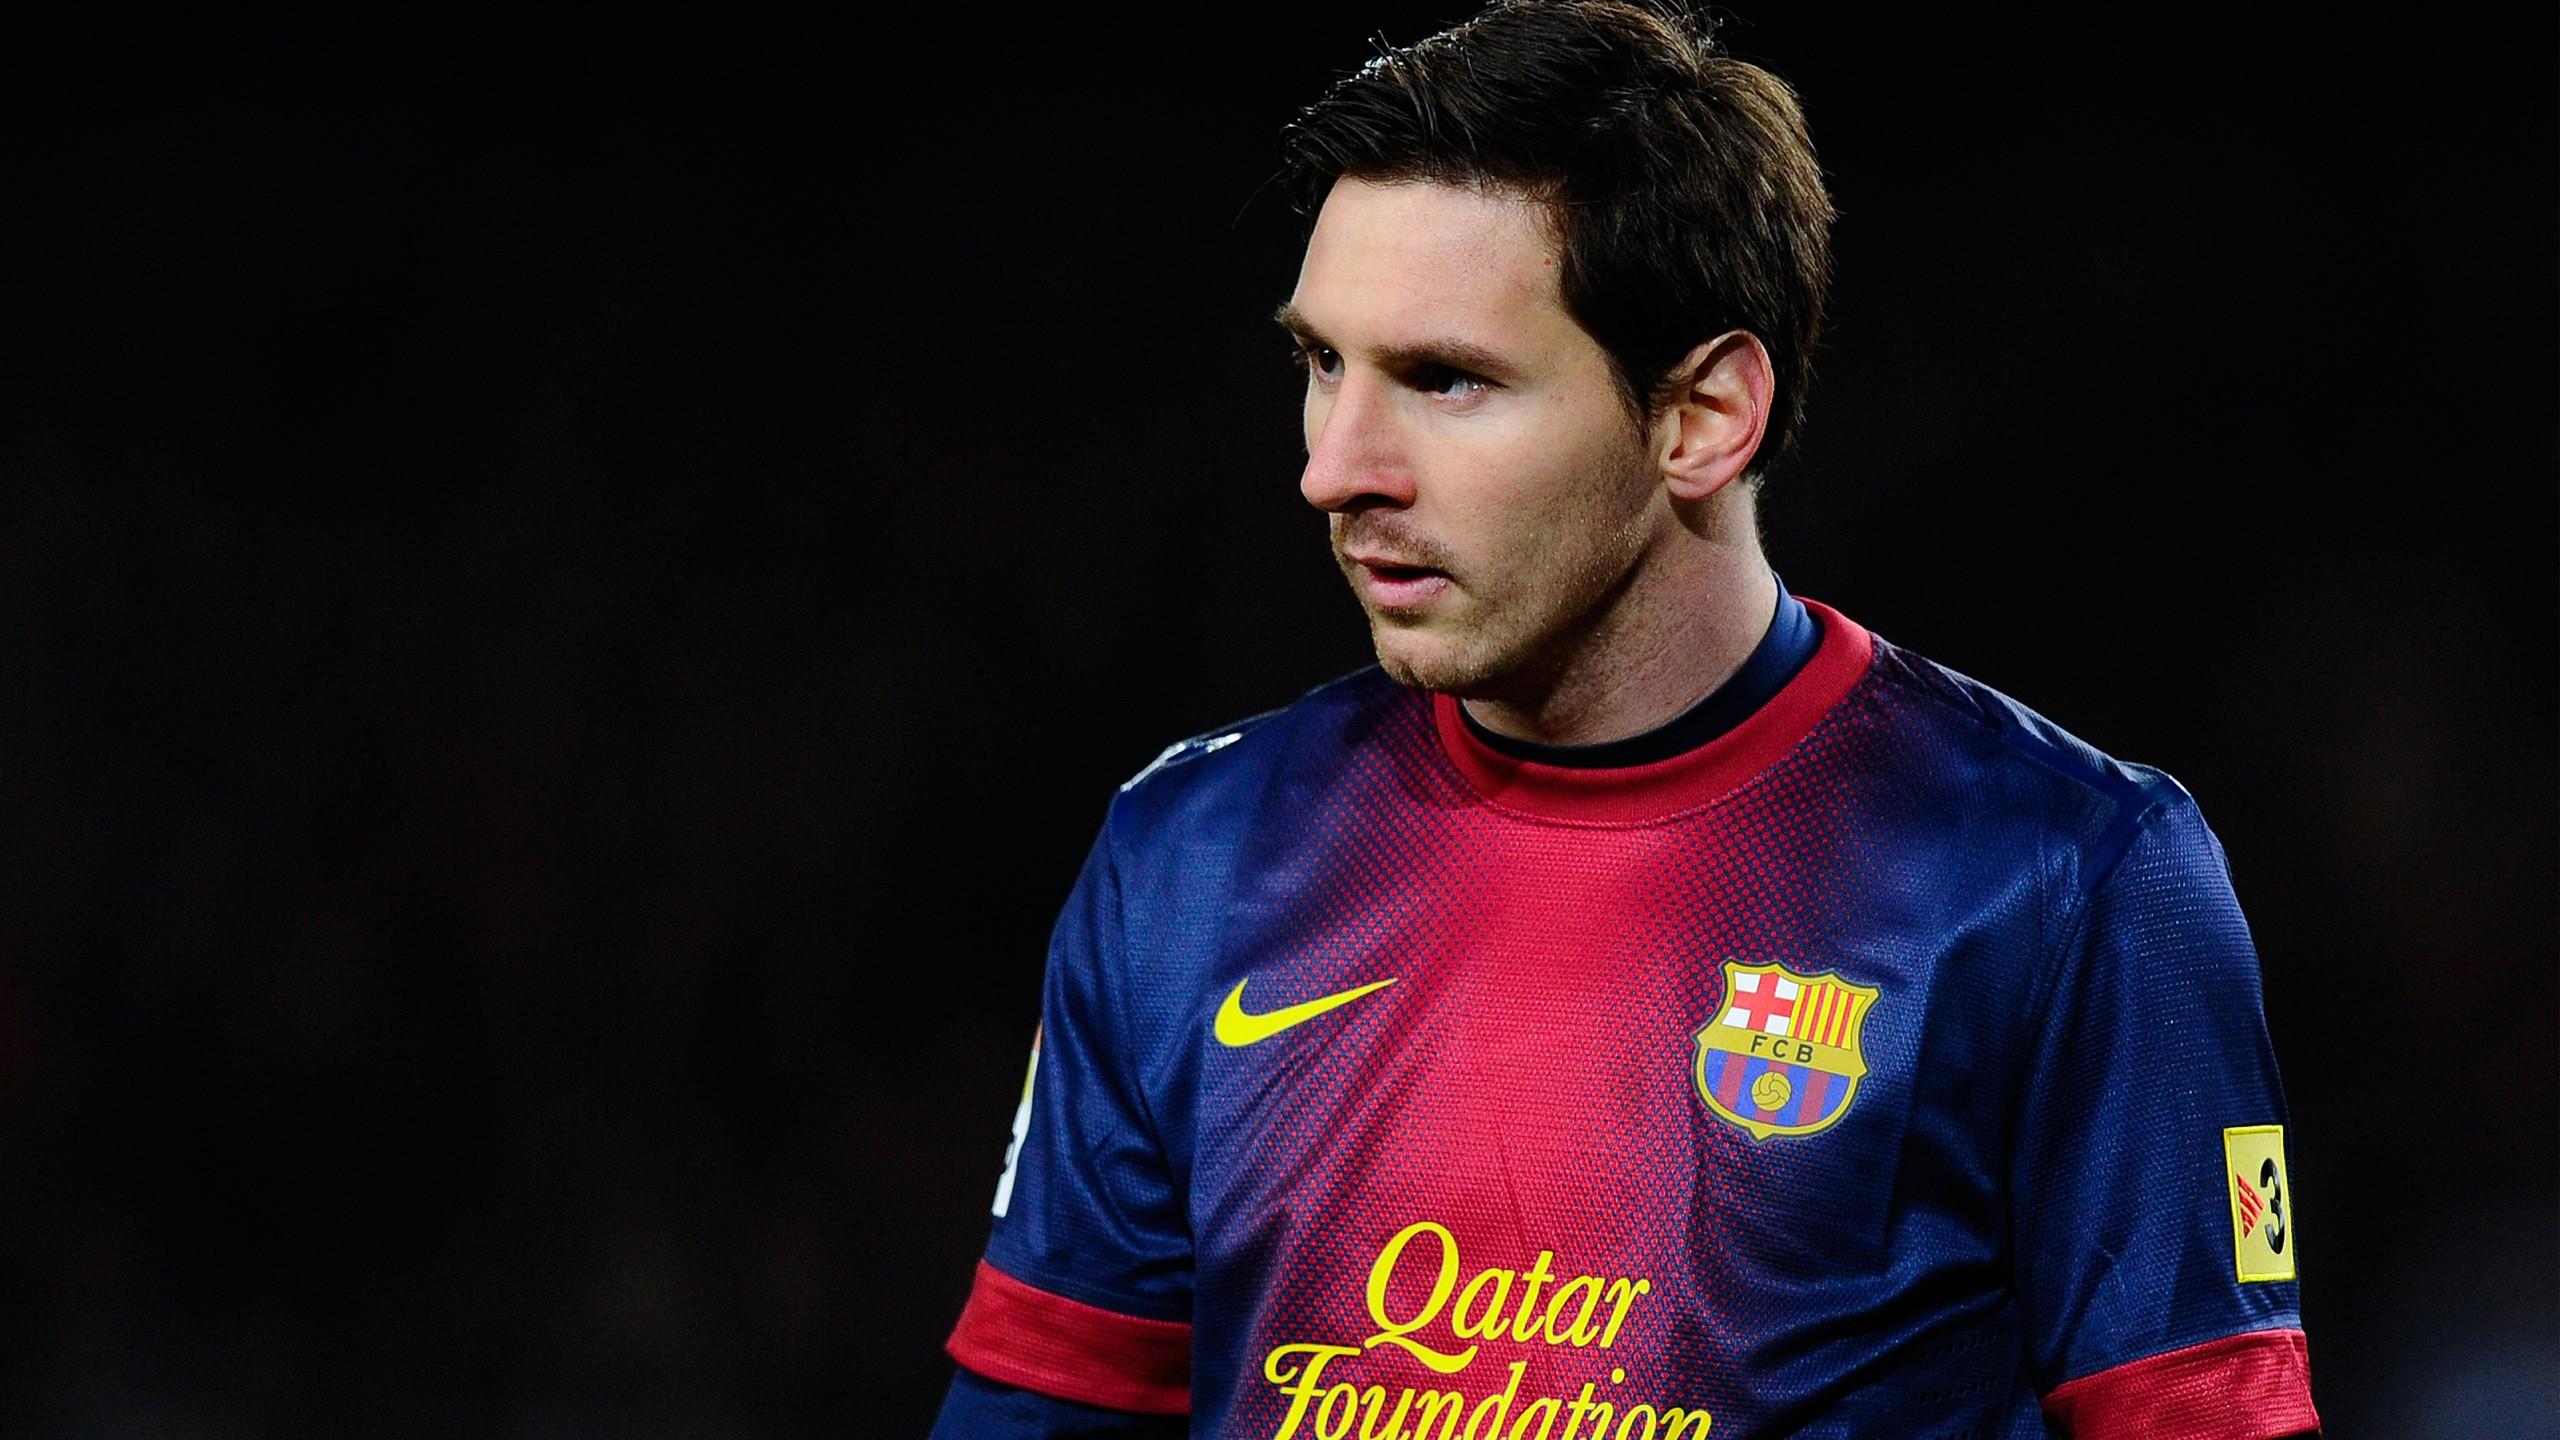 Messi Full Hd Wallpaper Lionel Messi Fc Barcelona Wallpapers Hd Wallpapers Id